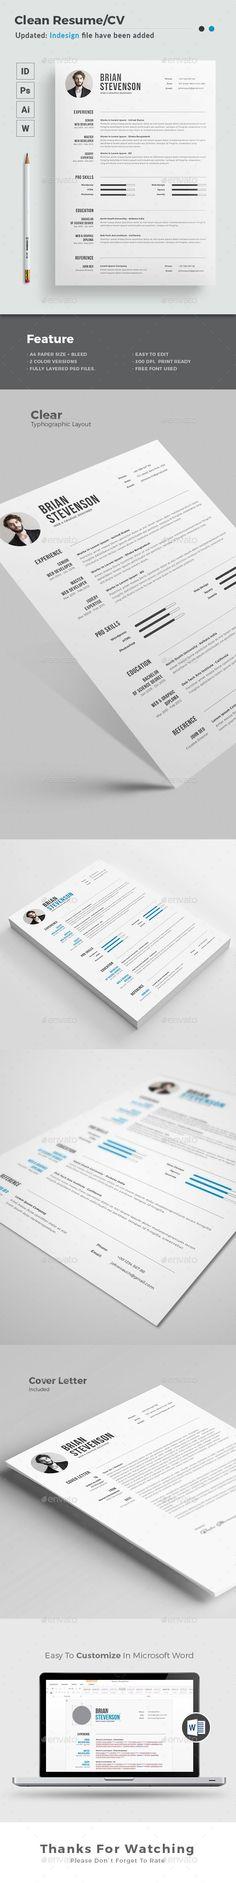 8 best winword resume templates images on pinterest resume resume